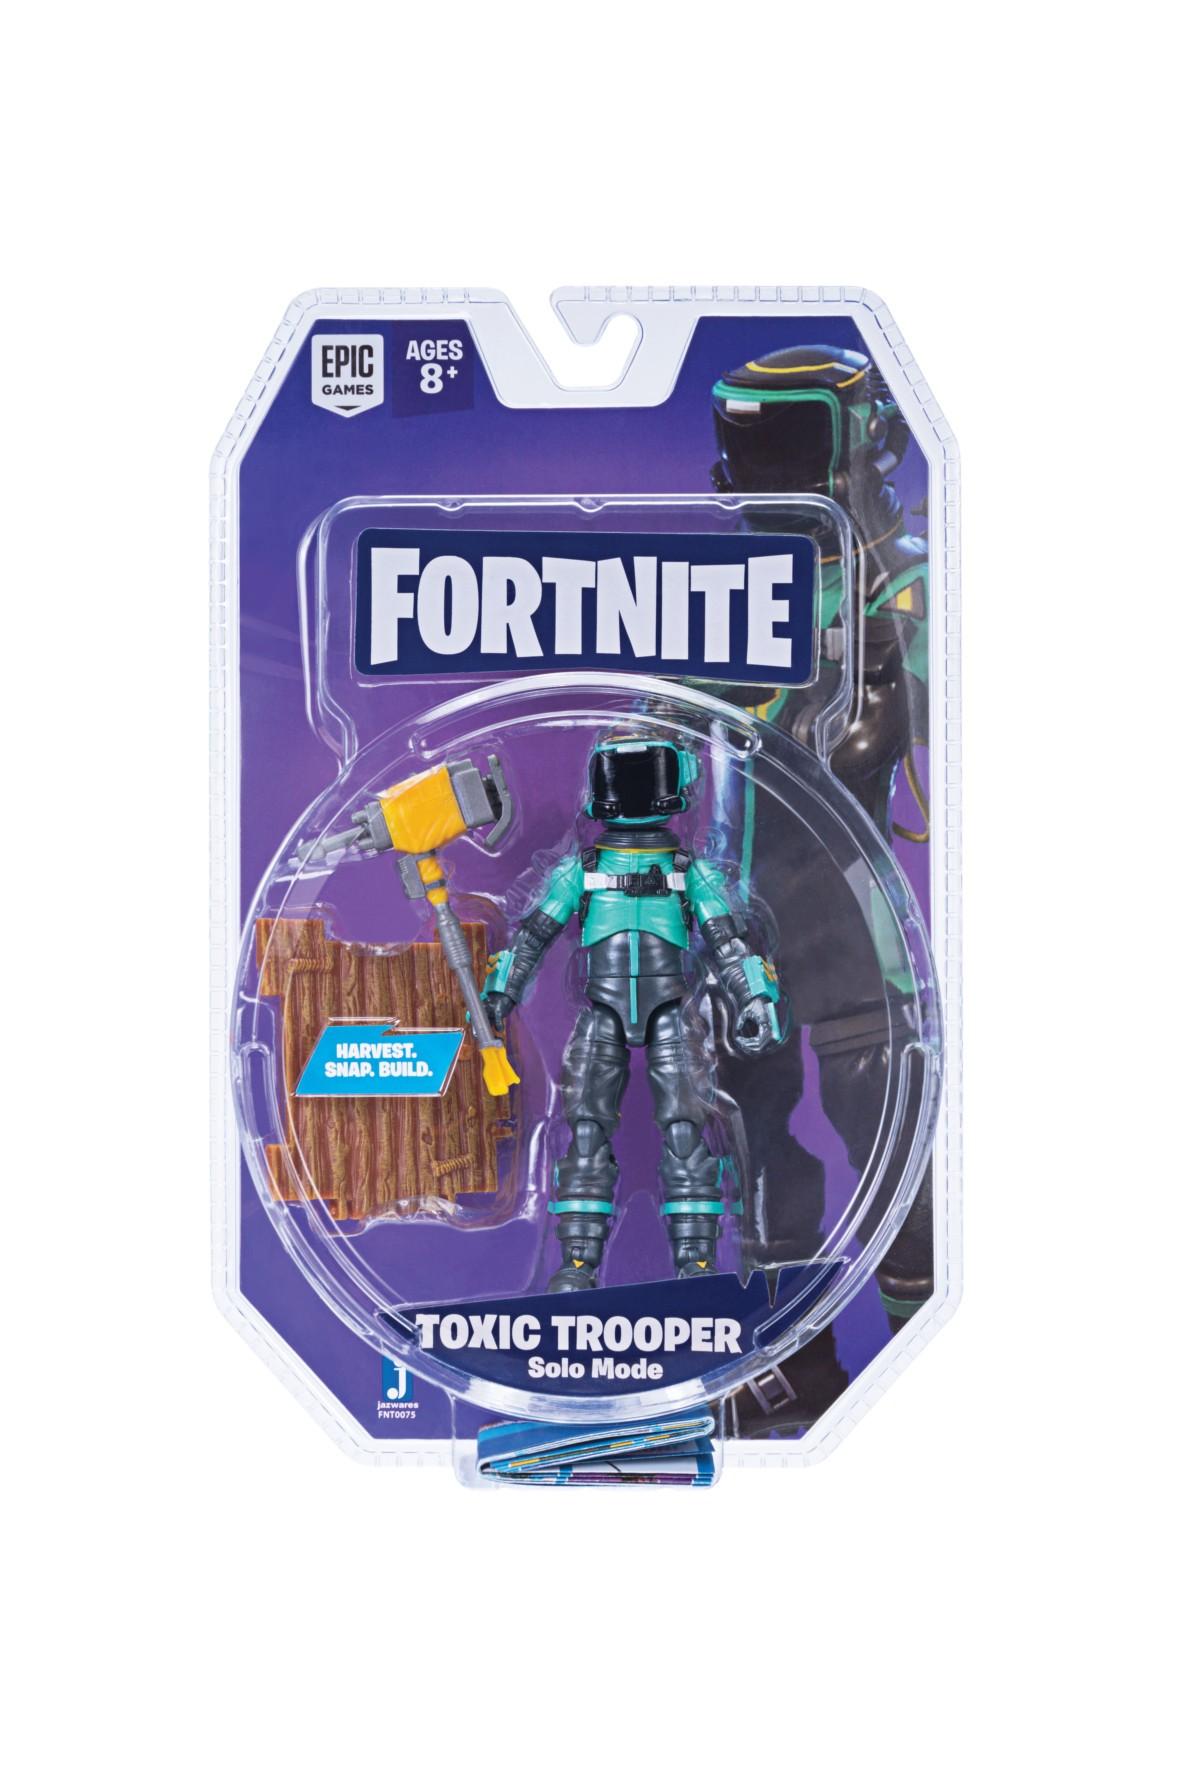 Fortnite figurka Toxic Trooper 8+